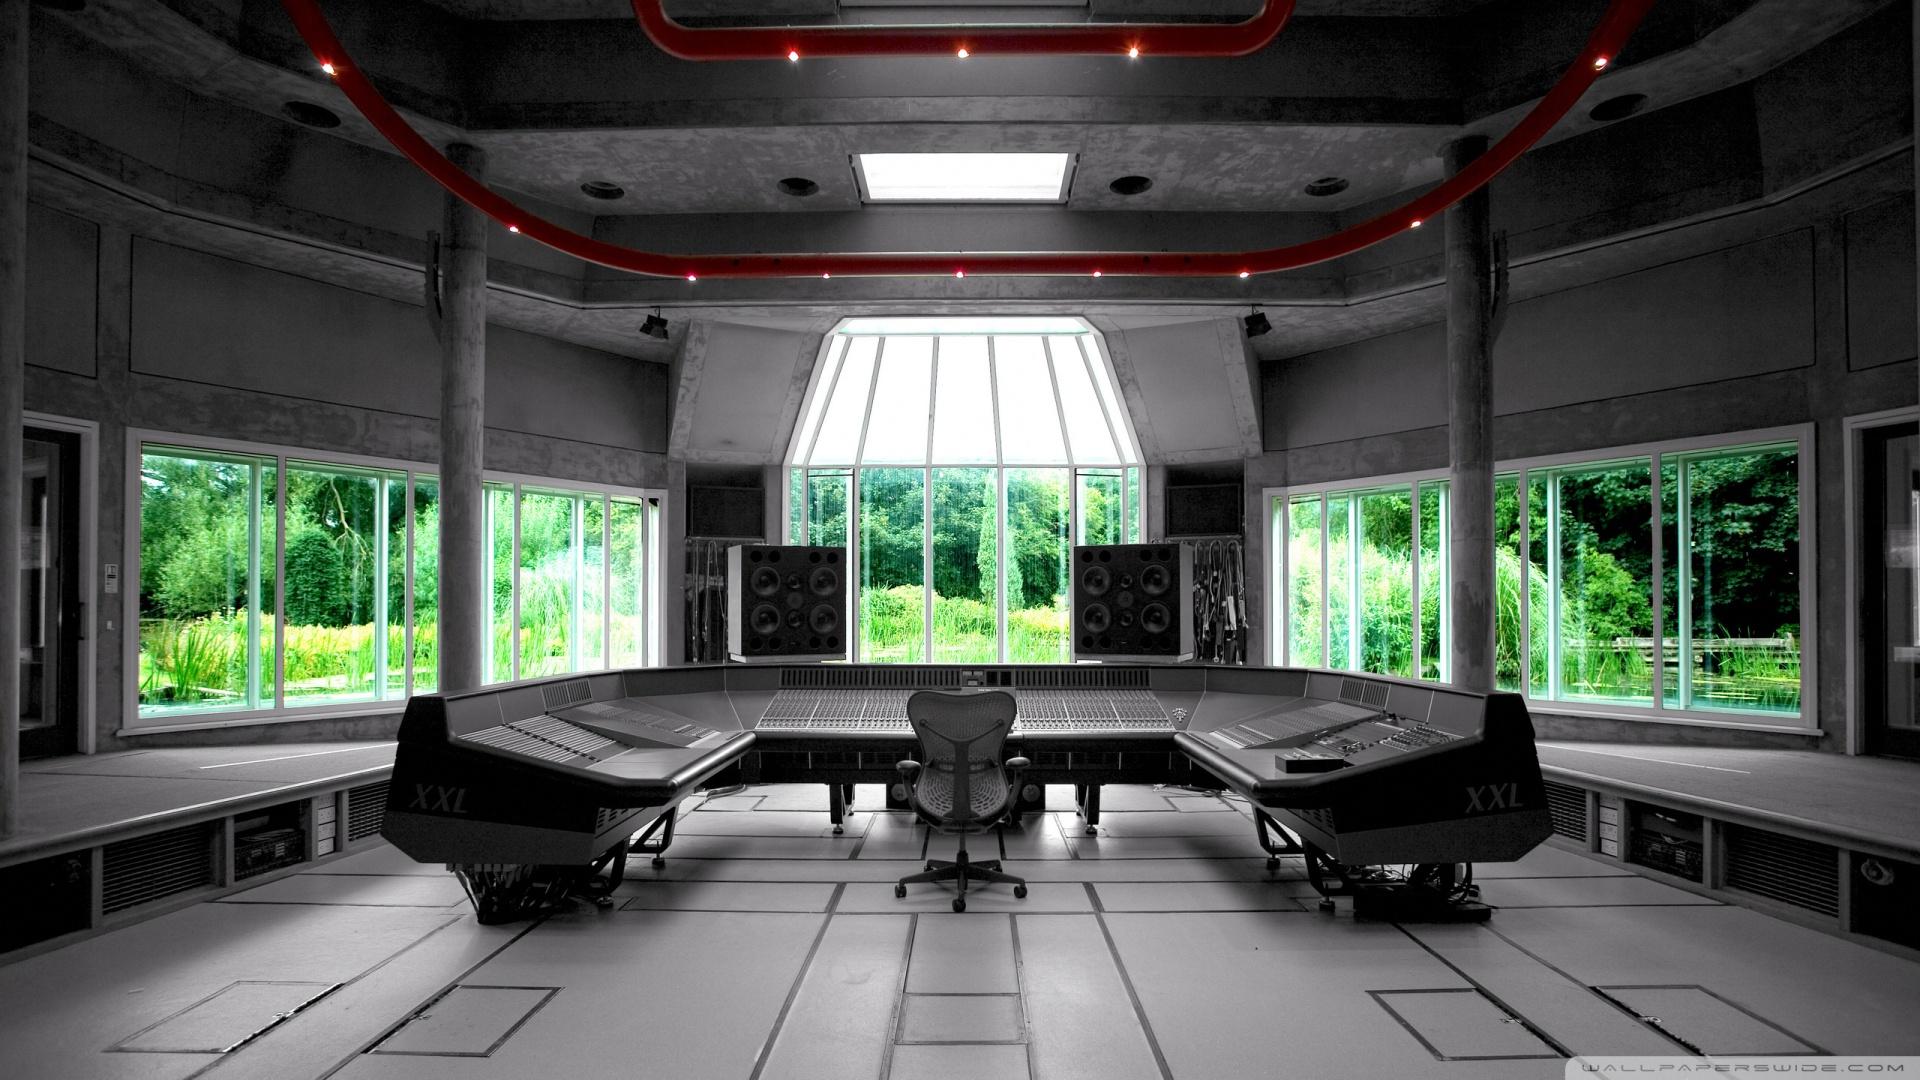 Music Recording Studio Wallpaper 1920x1080 Music Recording Studio 1920x1080